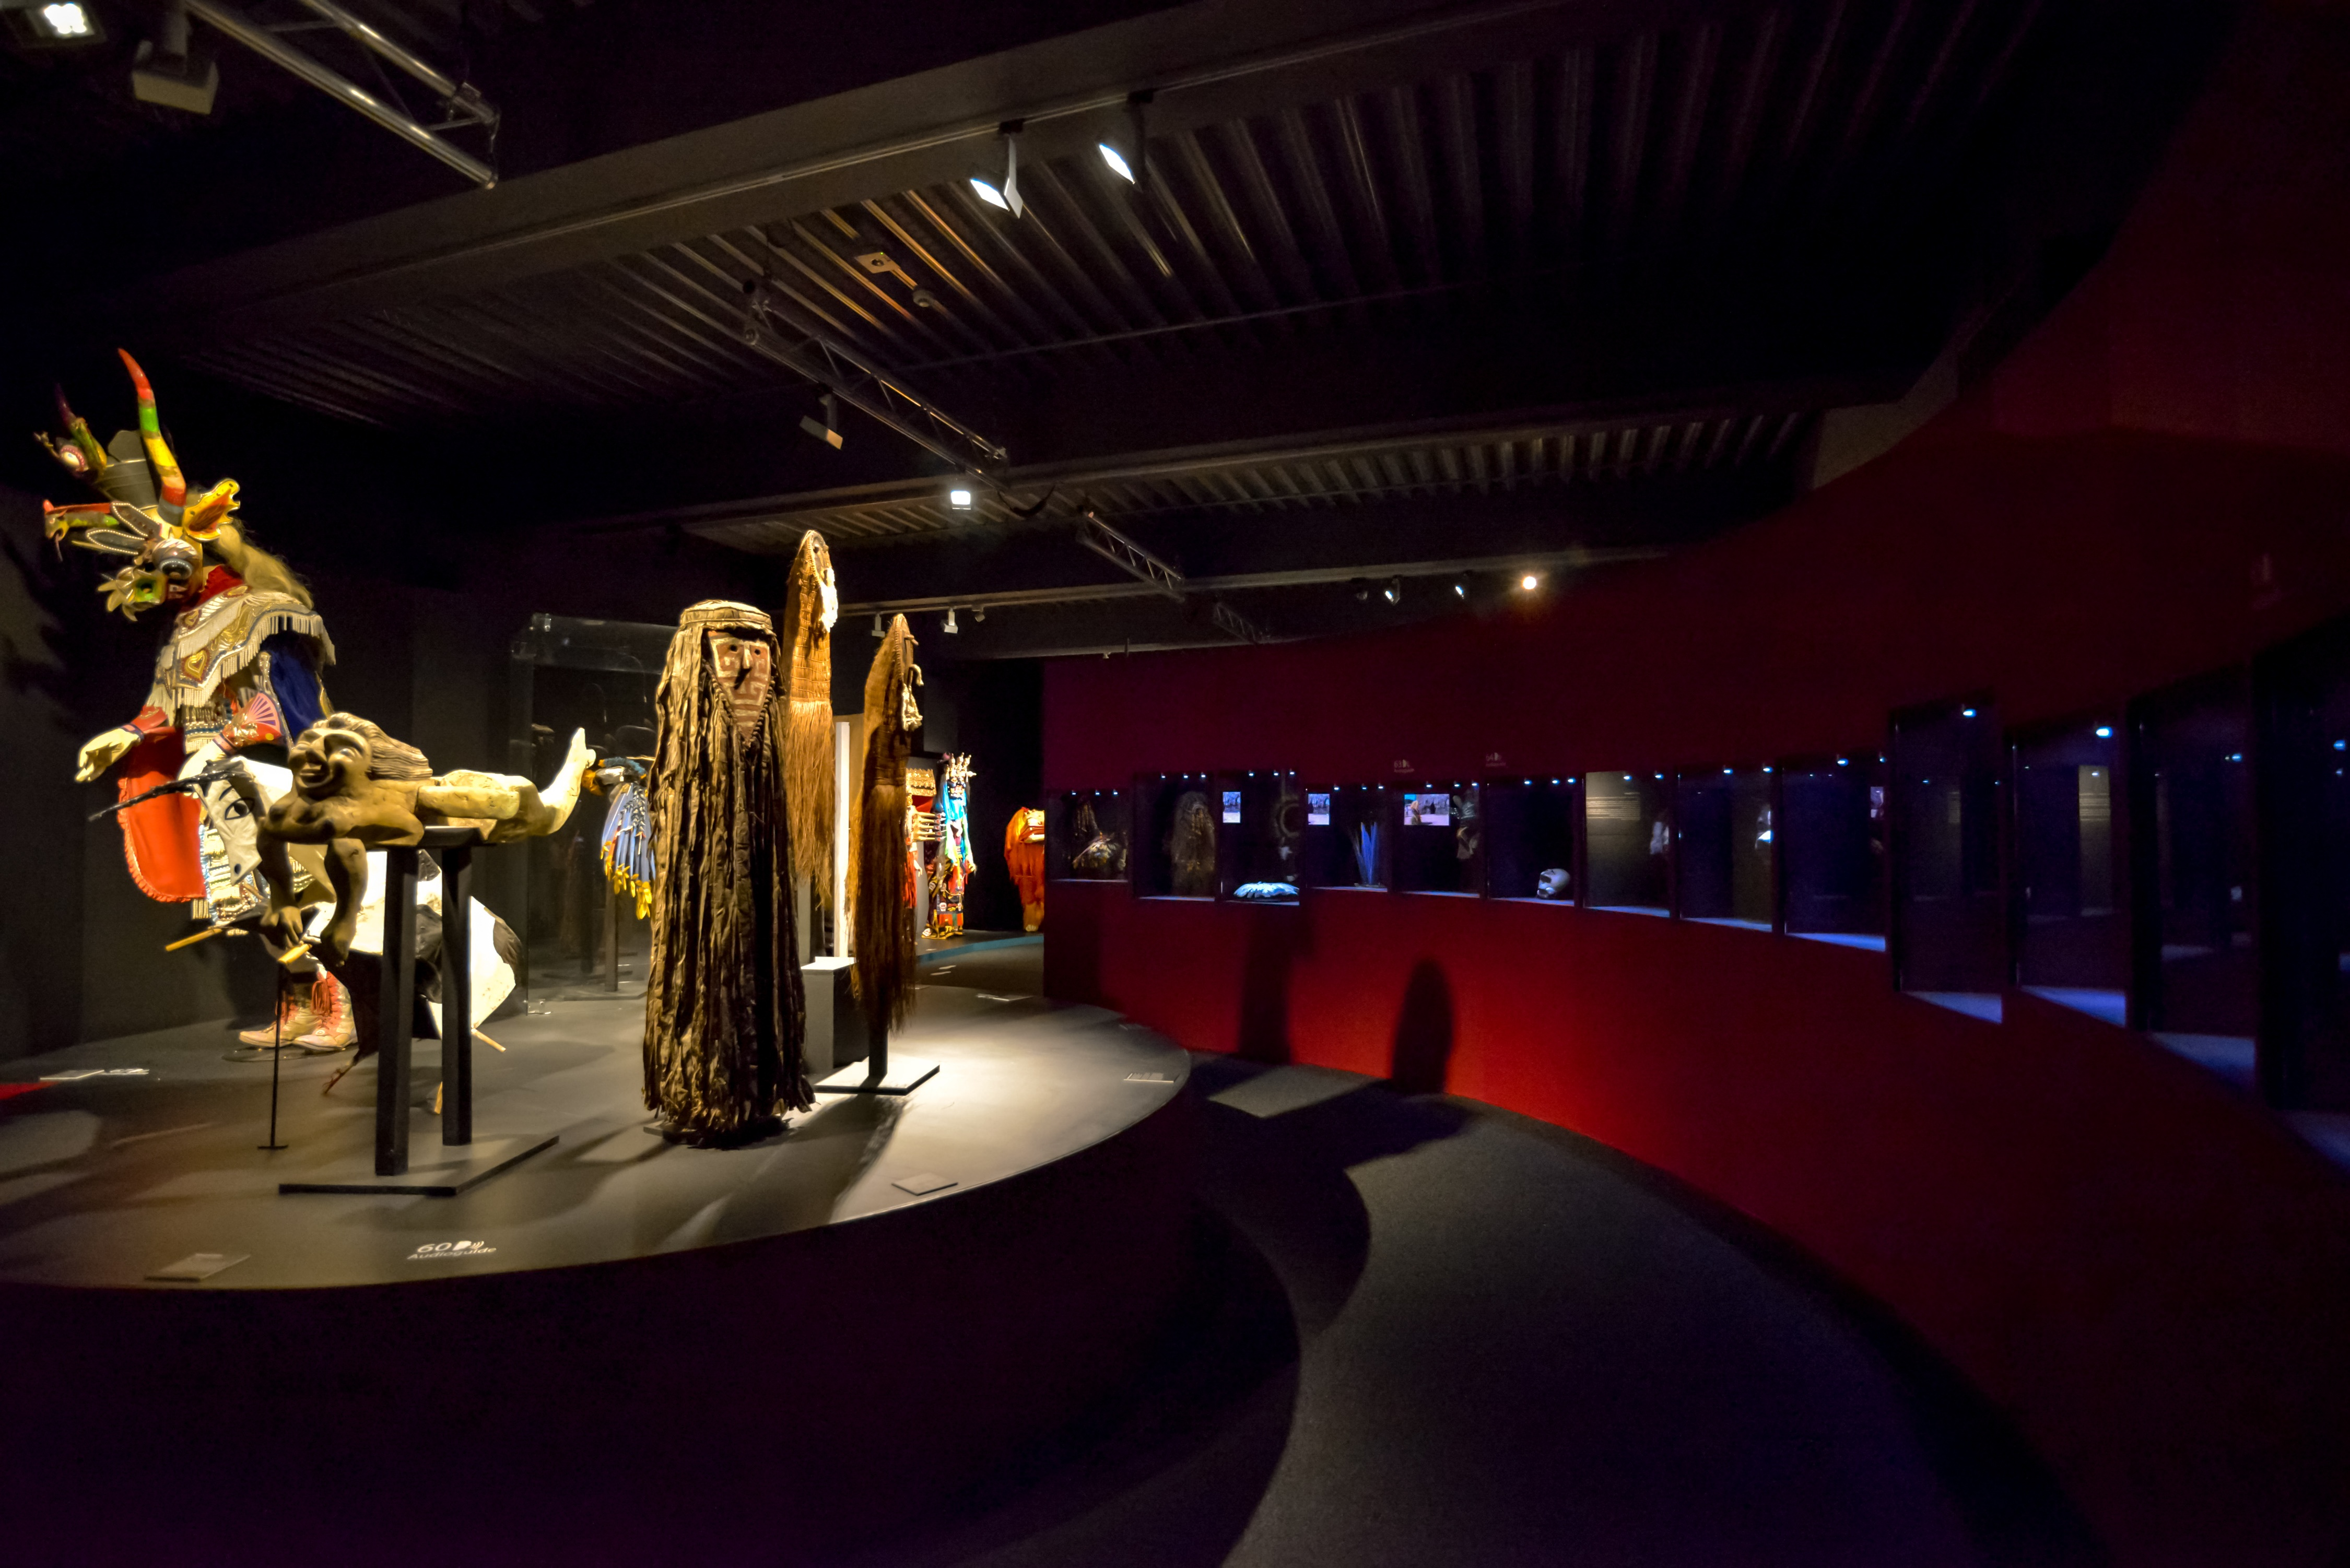 Musée international du Carnaval et du Masque - Binche